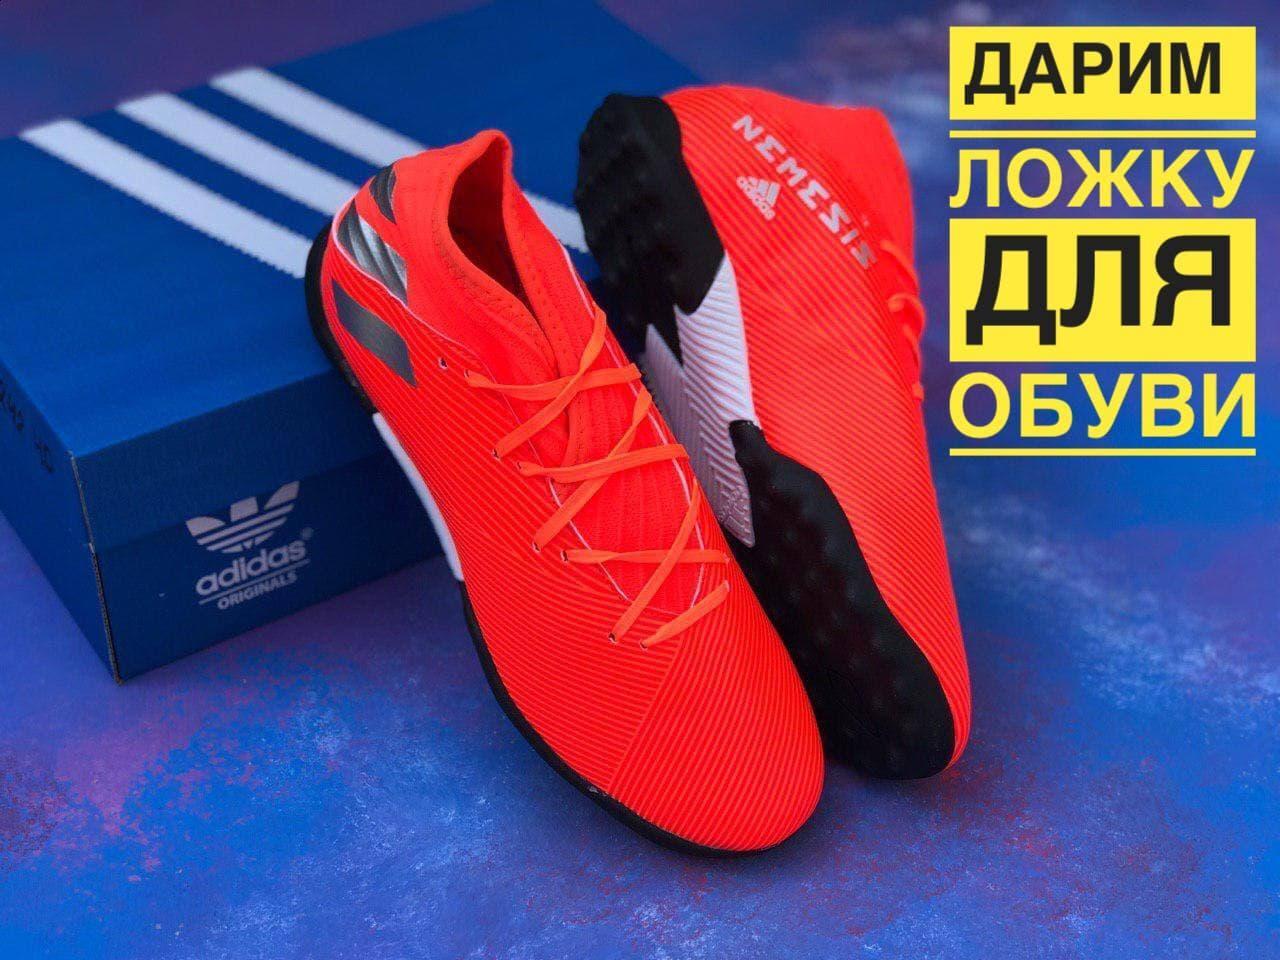 Стоноги Adidas Nemeziz 19.3 TF (адідас немезизи)